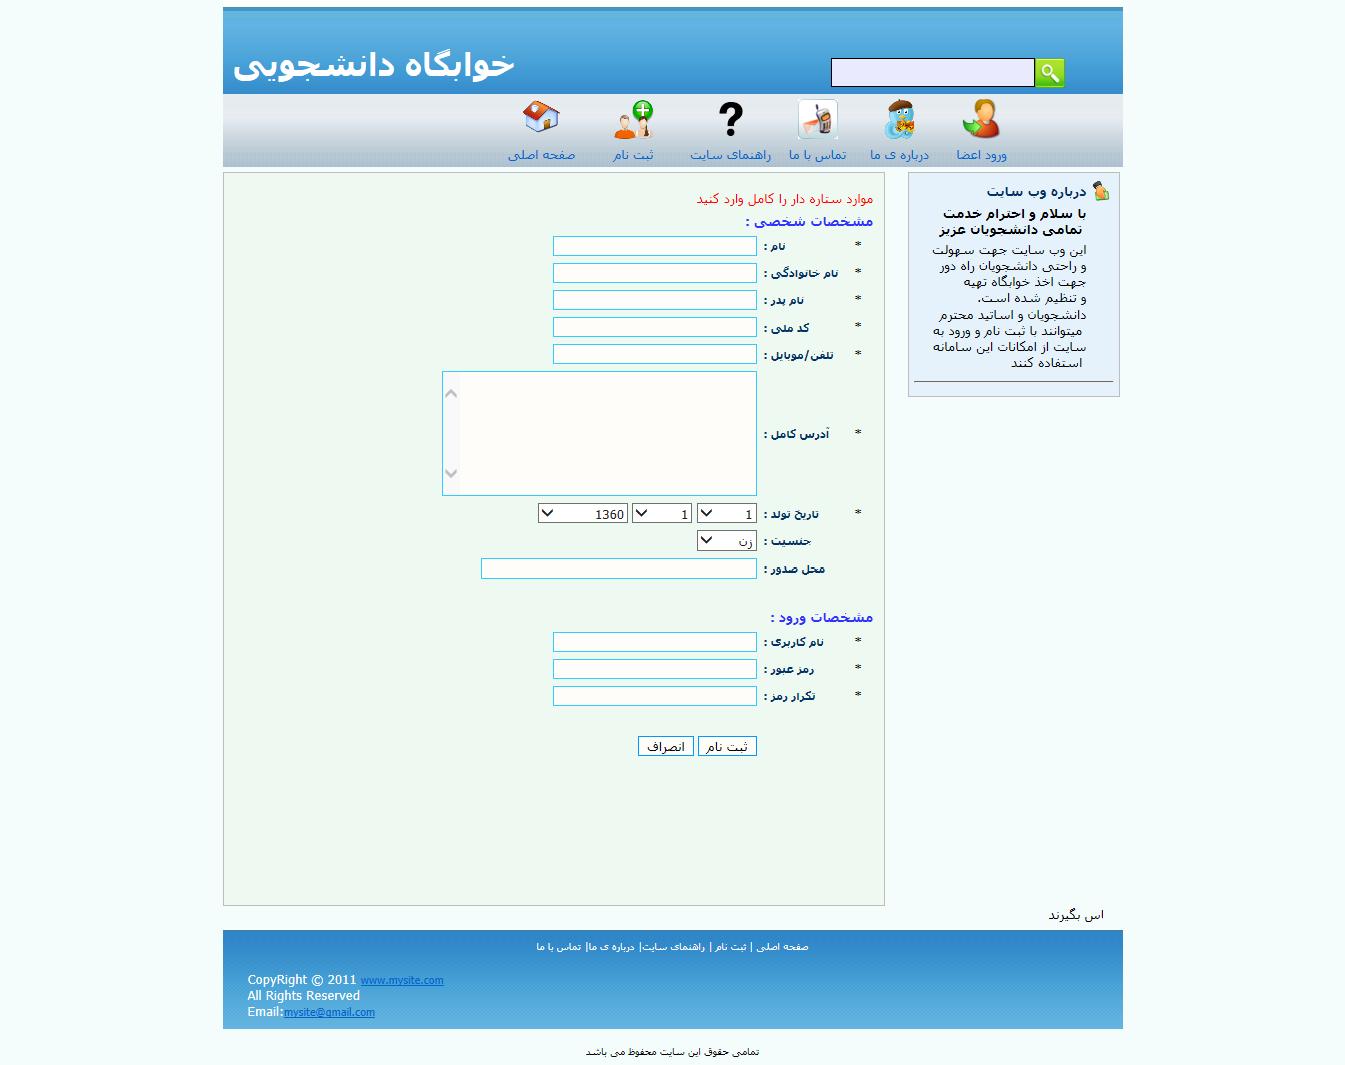 0-maon فروش پروژه طراحی وب سایت خوابگاه دانشجویی با asp.net ای اس پی